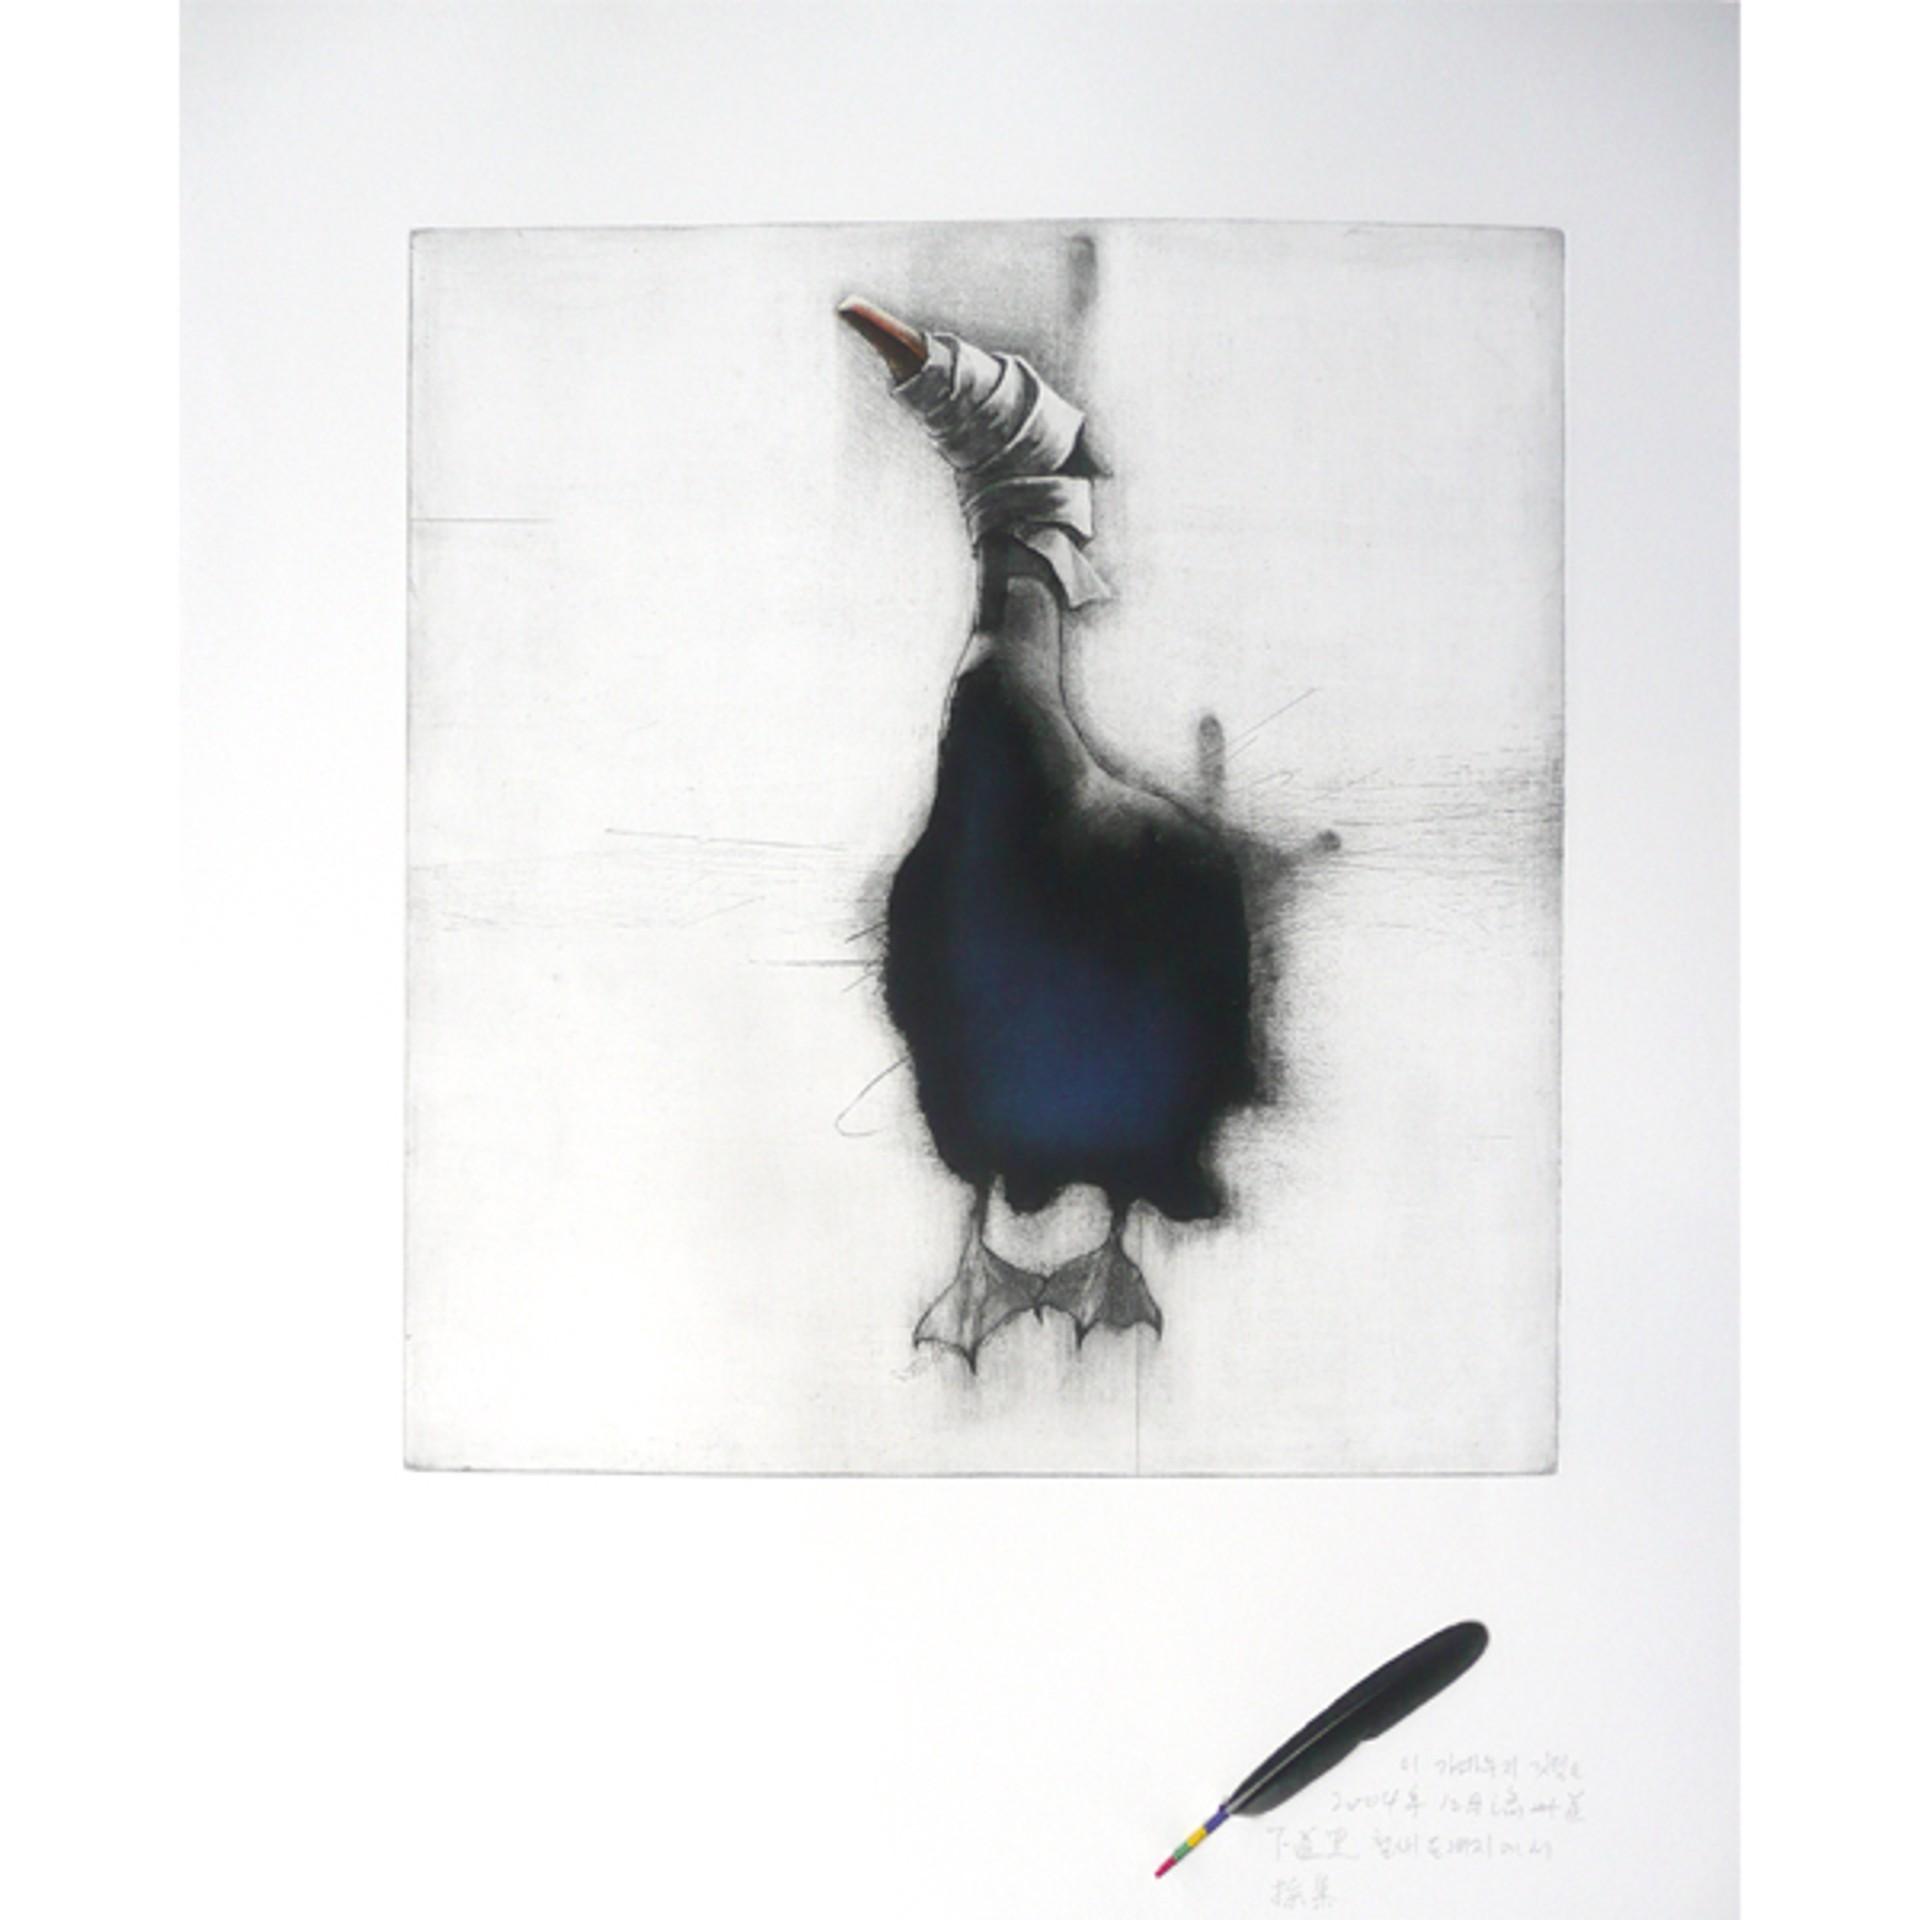 A Blind Bird: Comorant (3/10) by Gilchun Koh